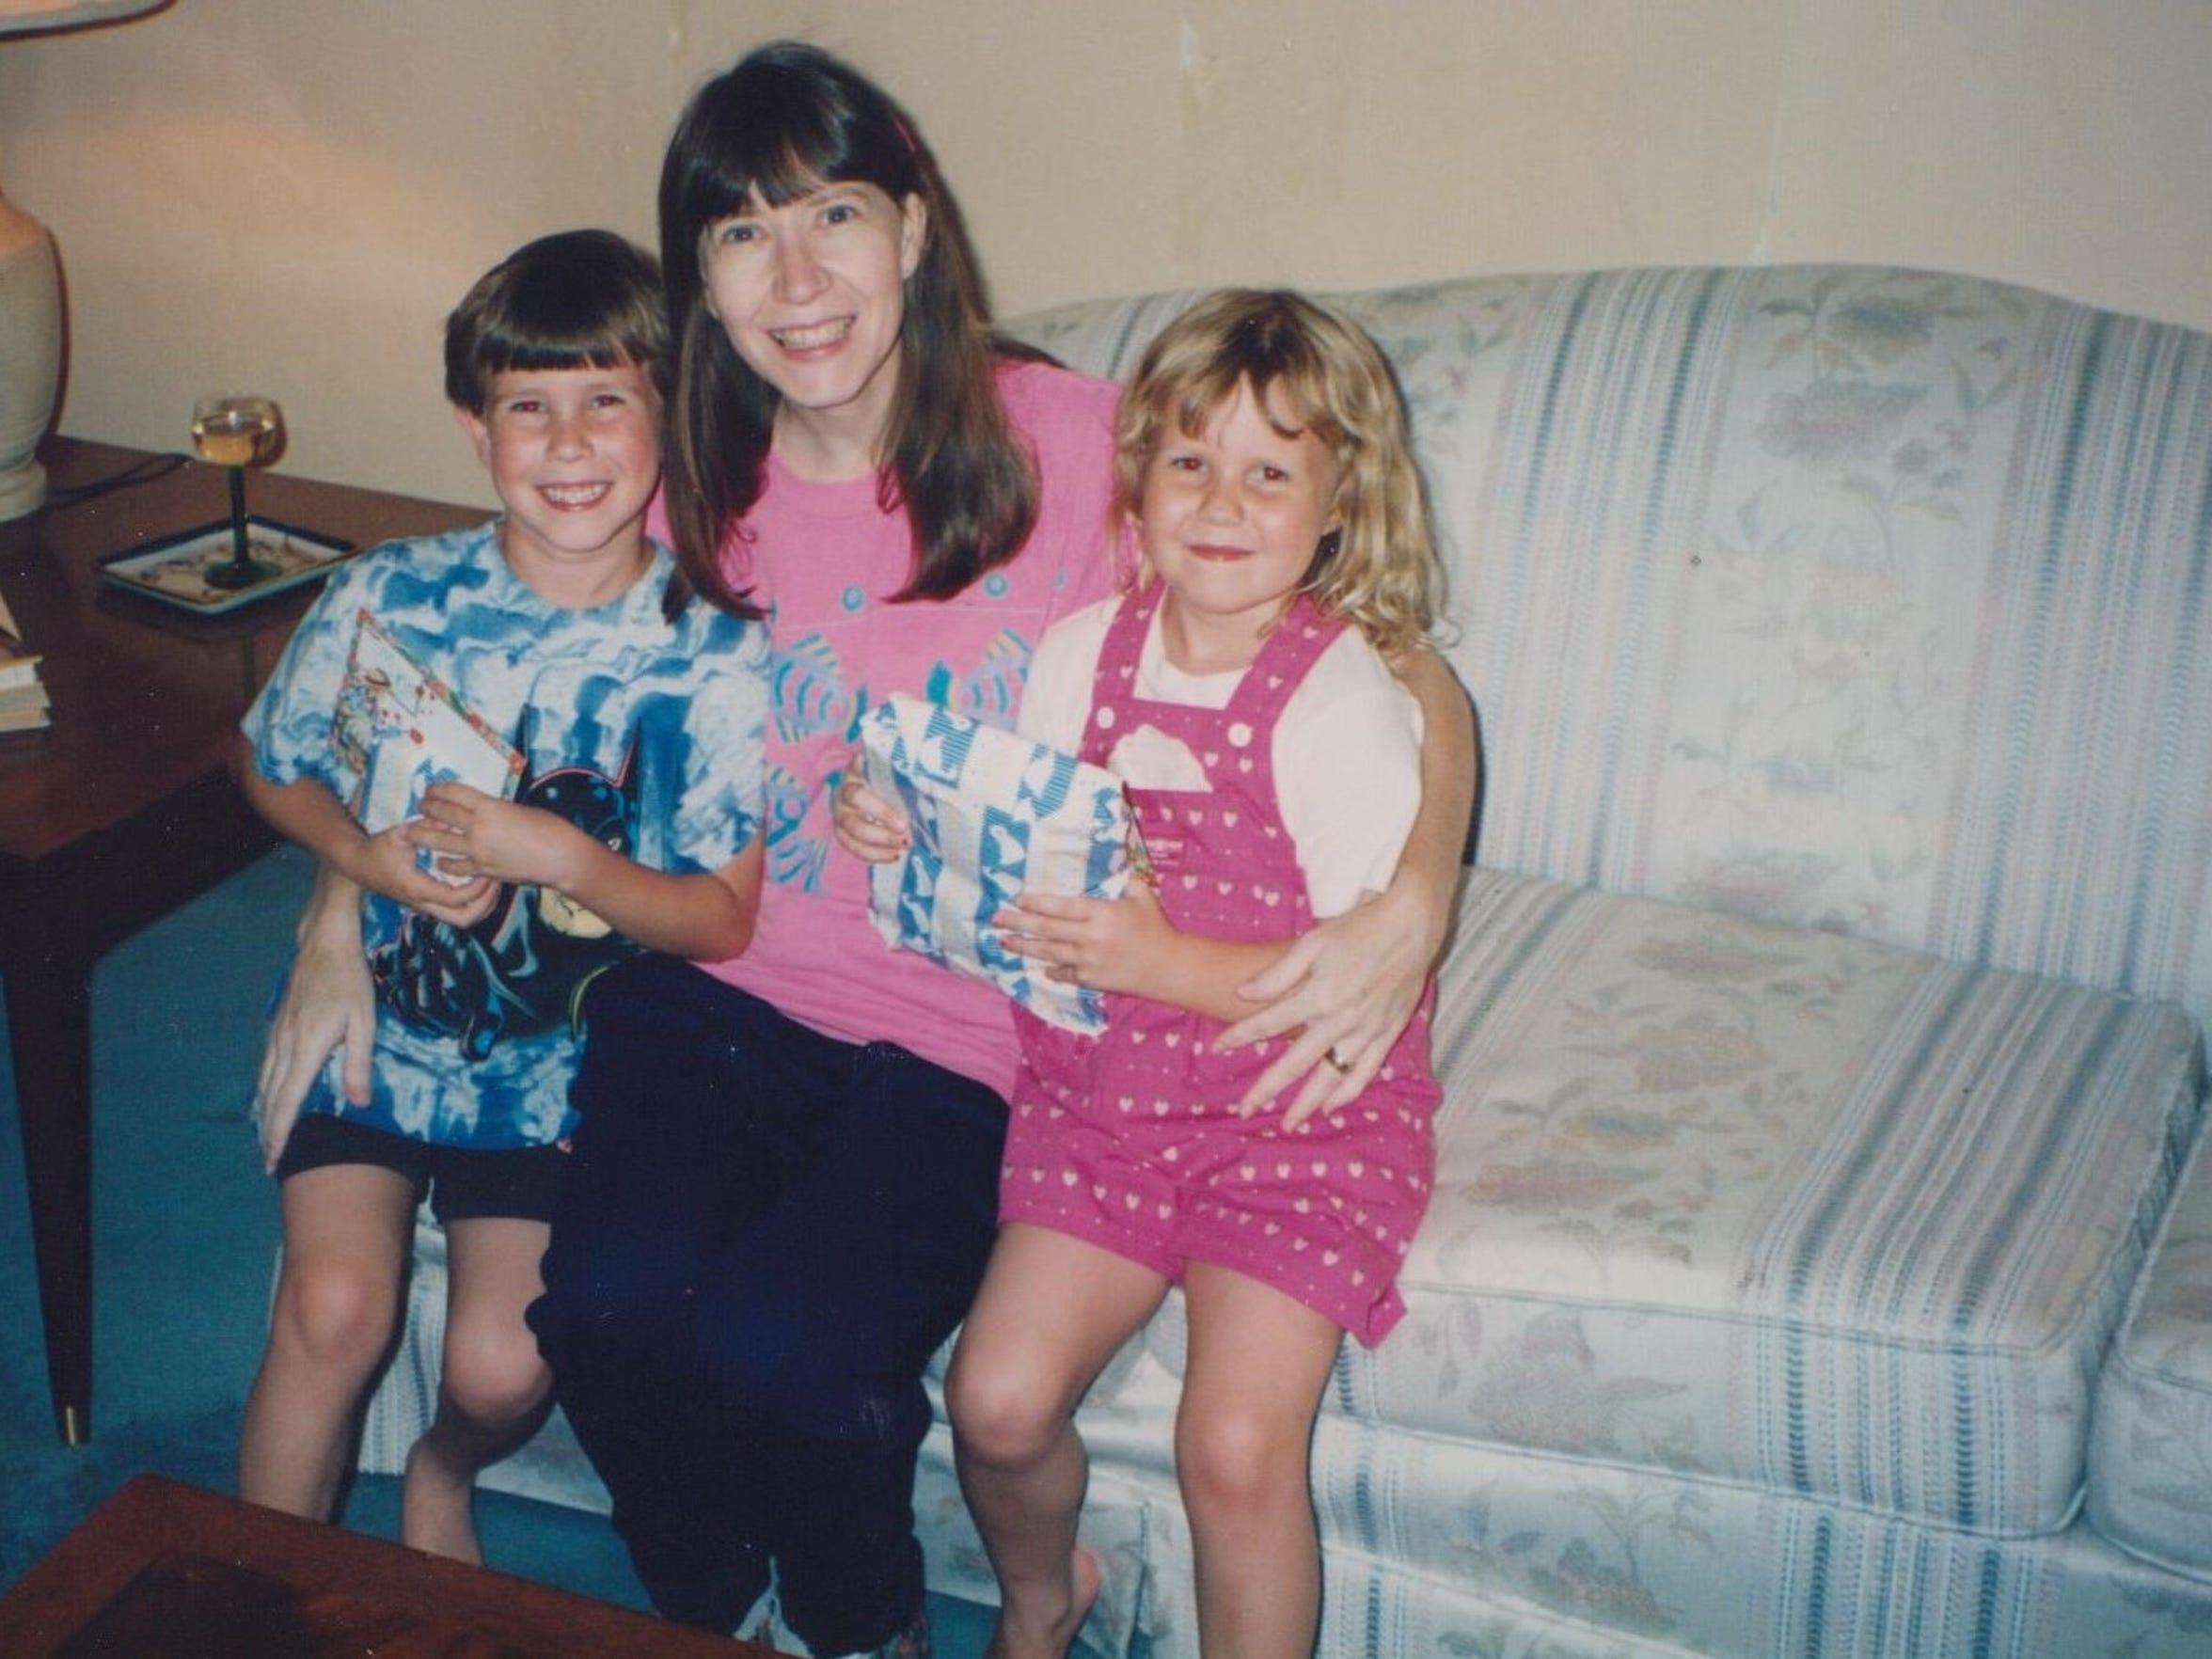 Ben Decker, Lynne Decker and Beth Decker pose for a